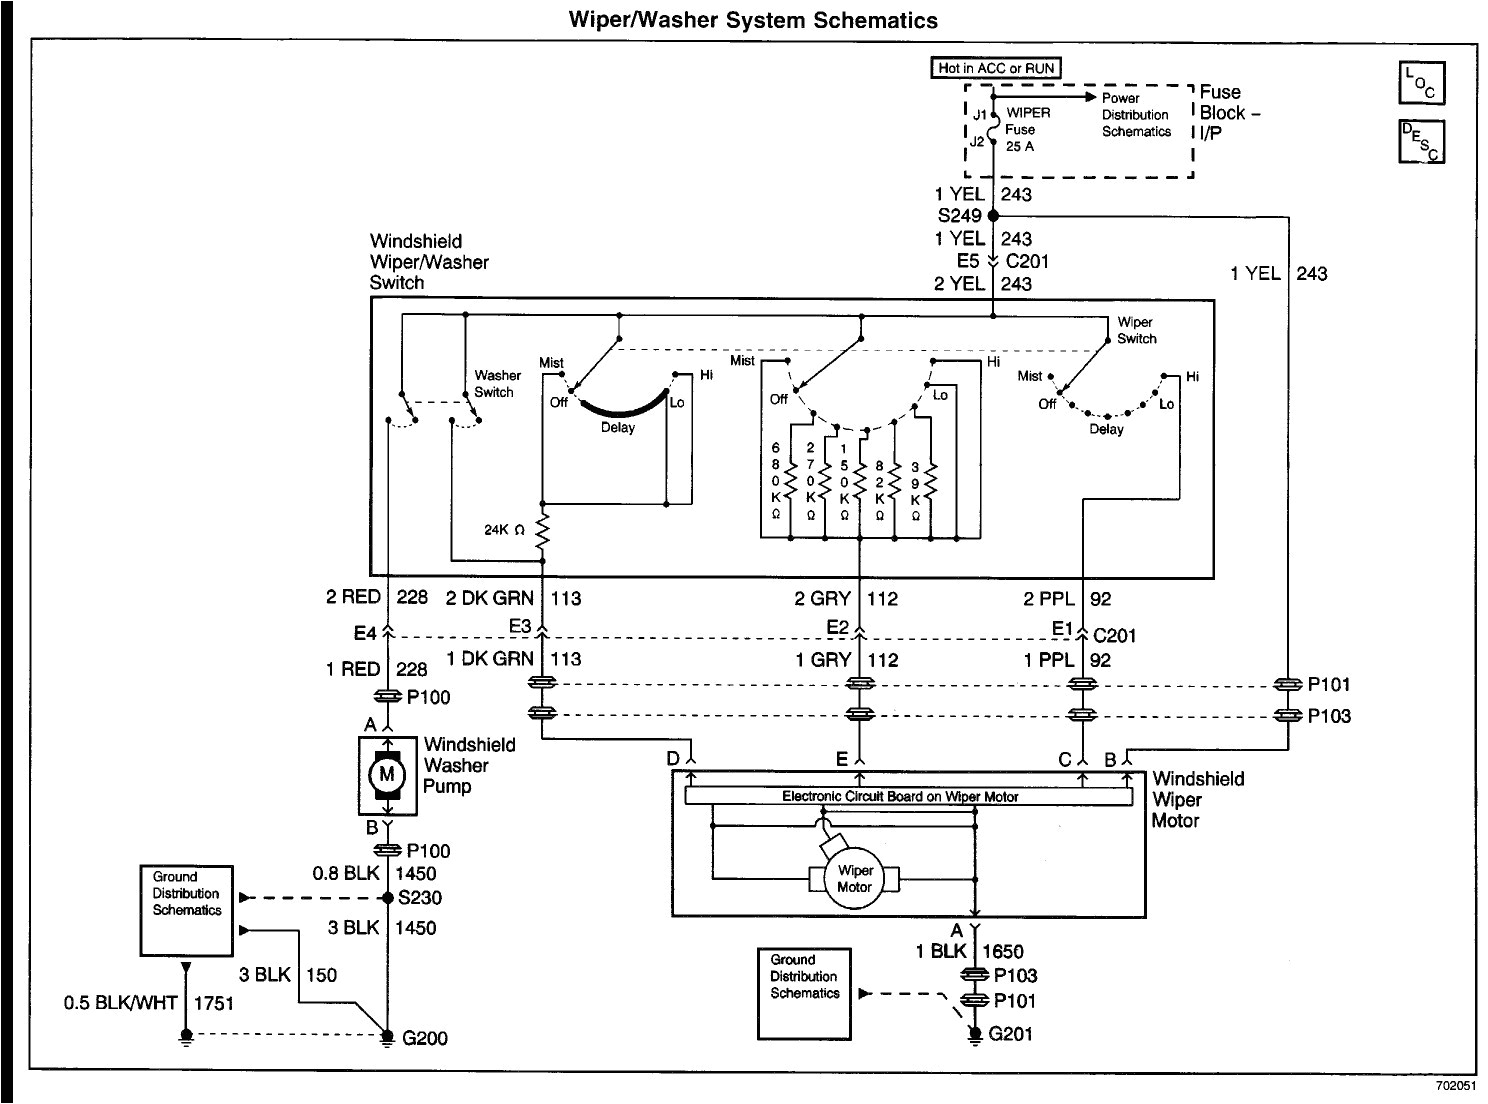 2001 buick lesabre wiring diagram wiring diagrams bib radio wiring color code as well buick century fuel pump relay diagram